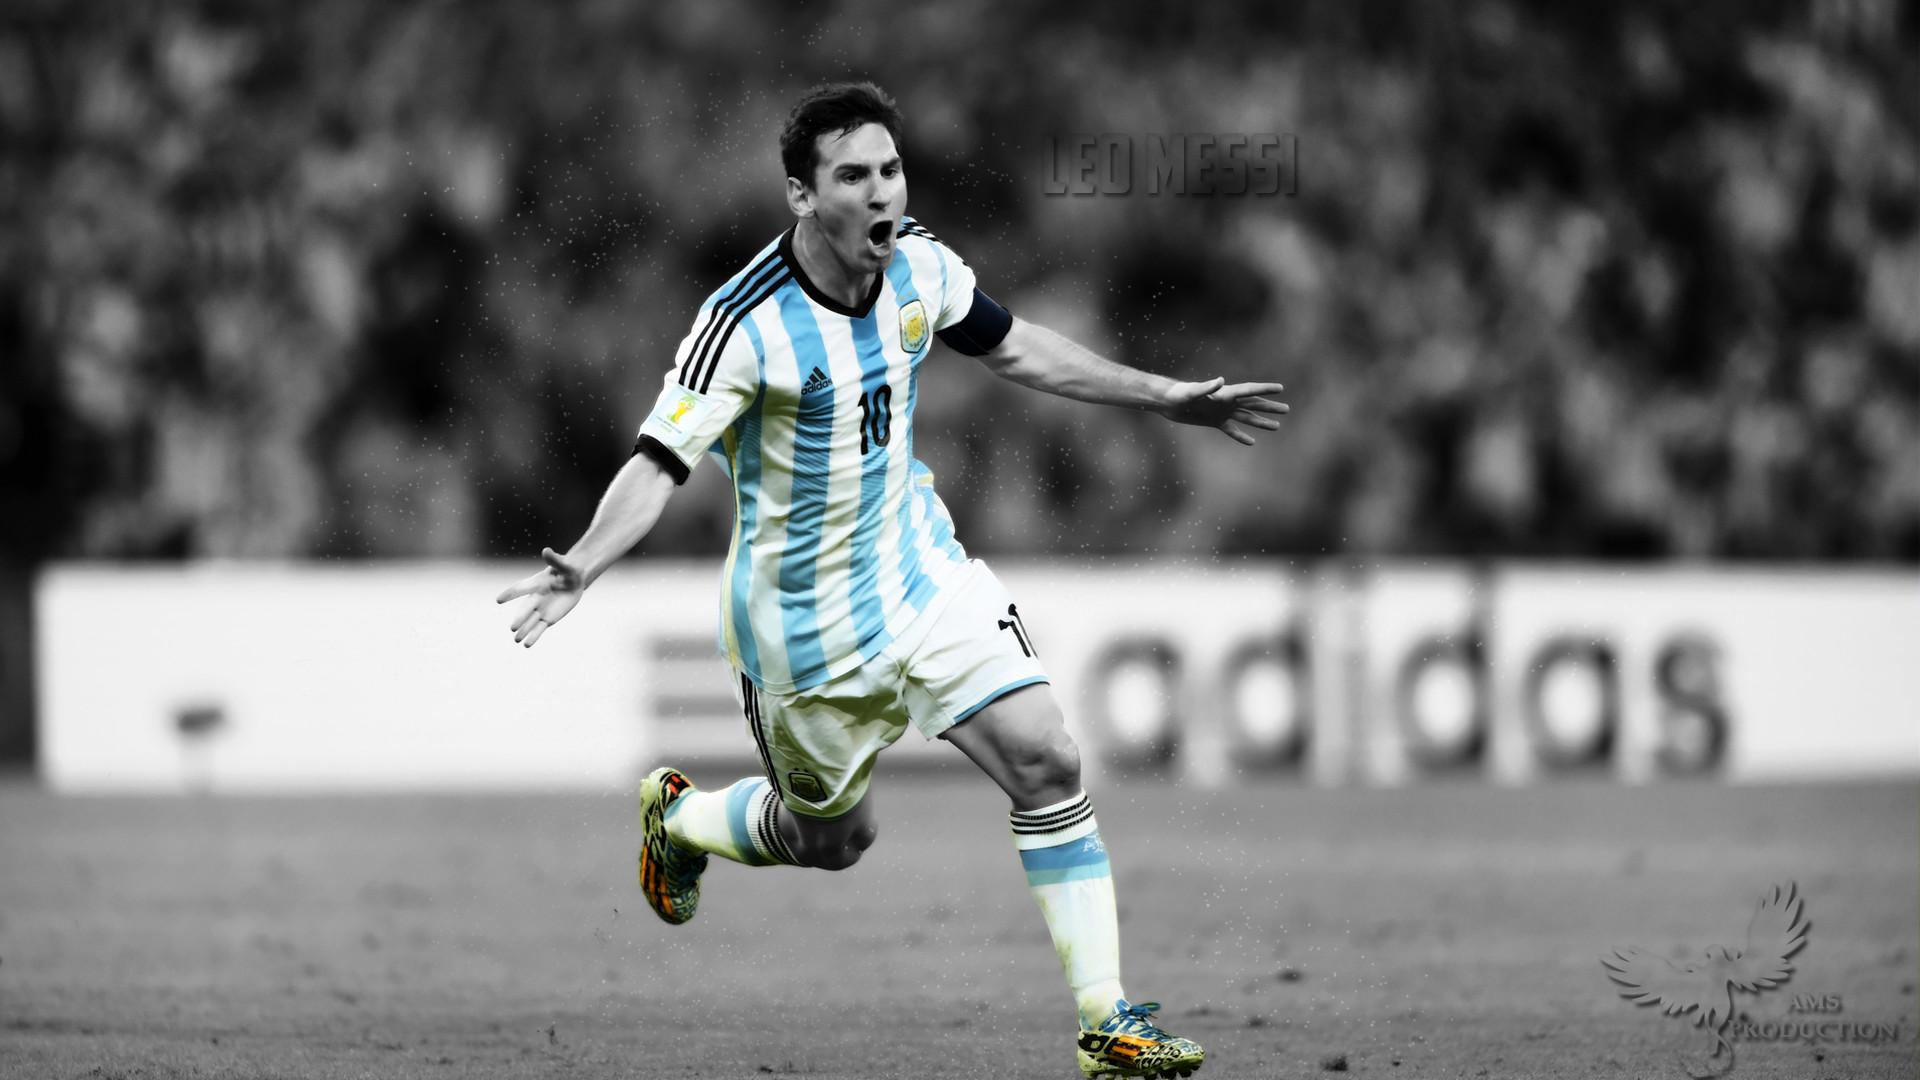 1920x1080 Leo Messi Argentina World Cup Celebration